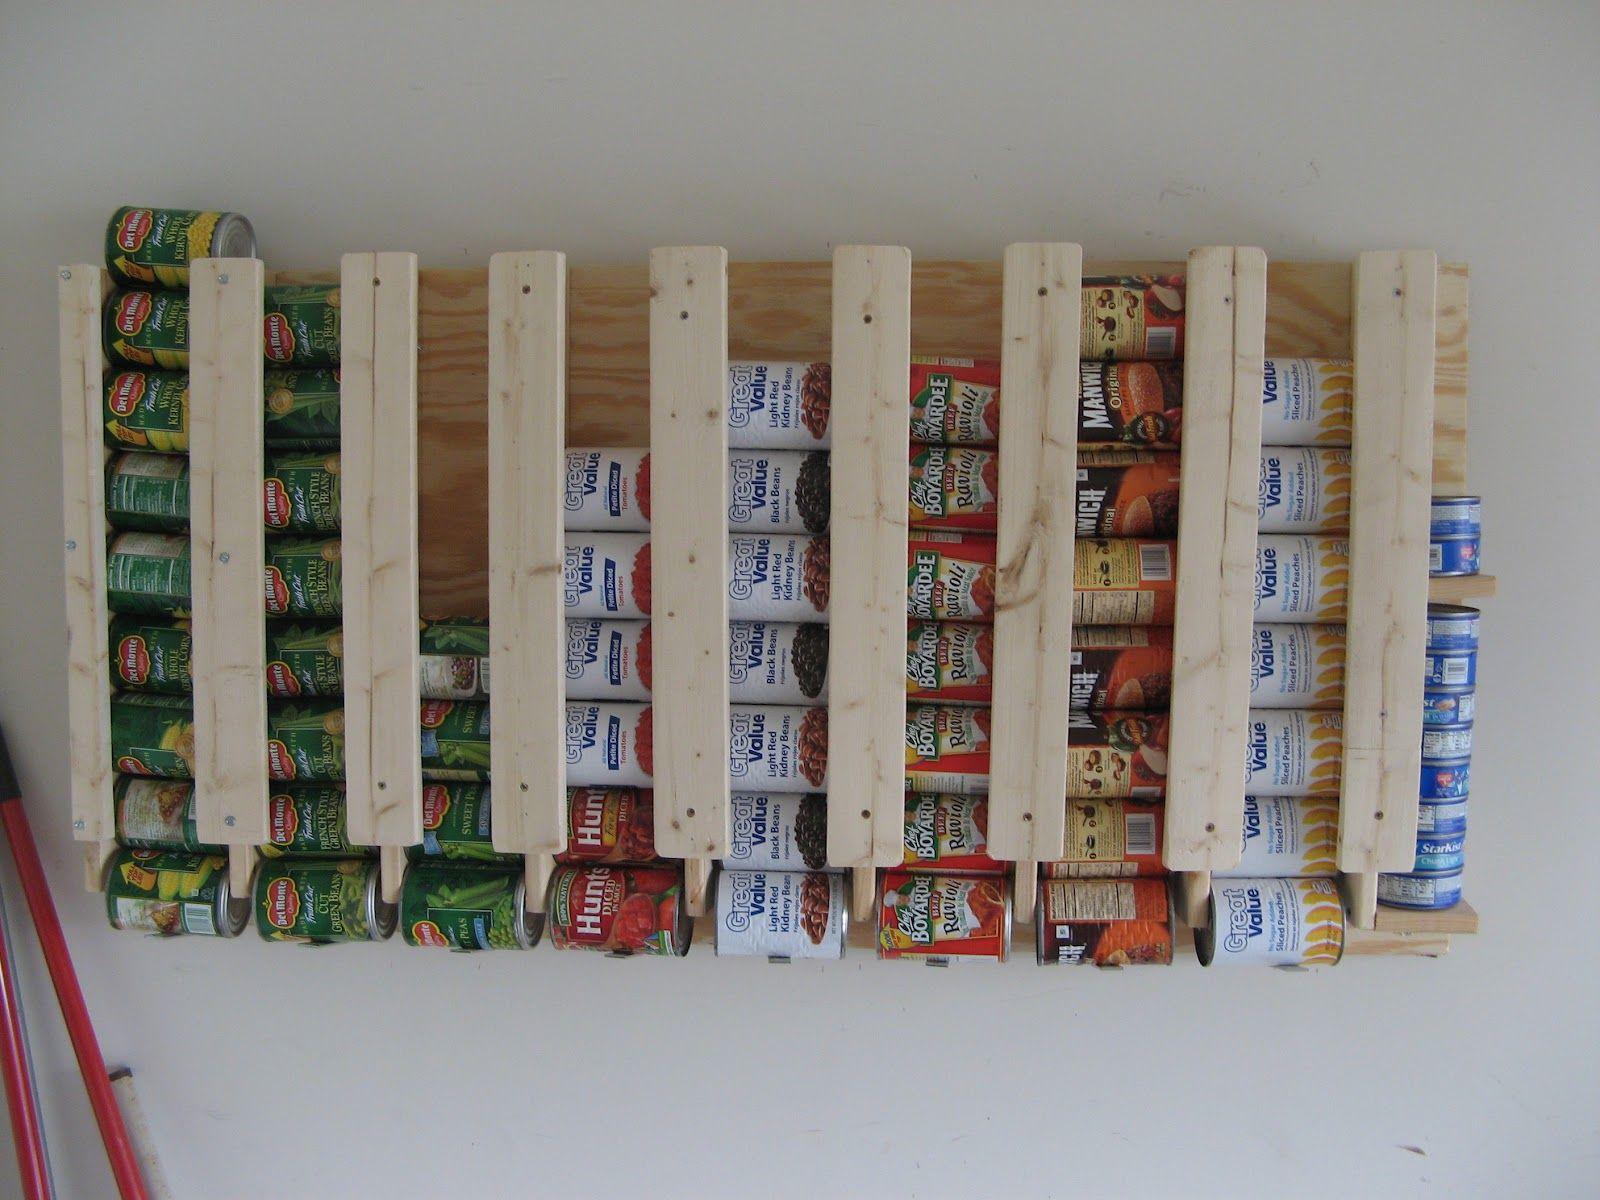 21 Smart Kitchen Organizing Ideas | Food storage, Storage rack and ...